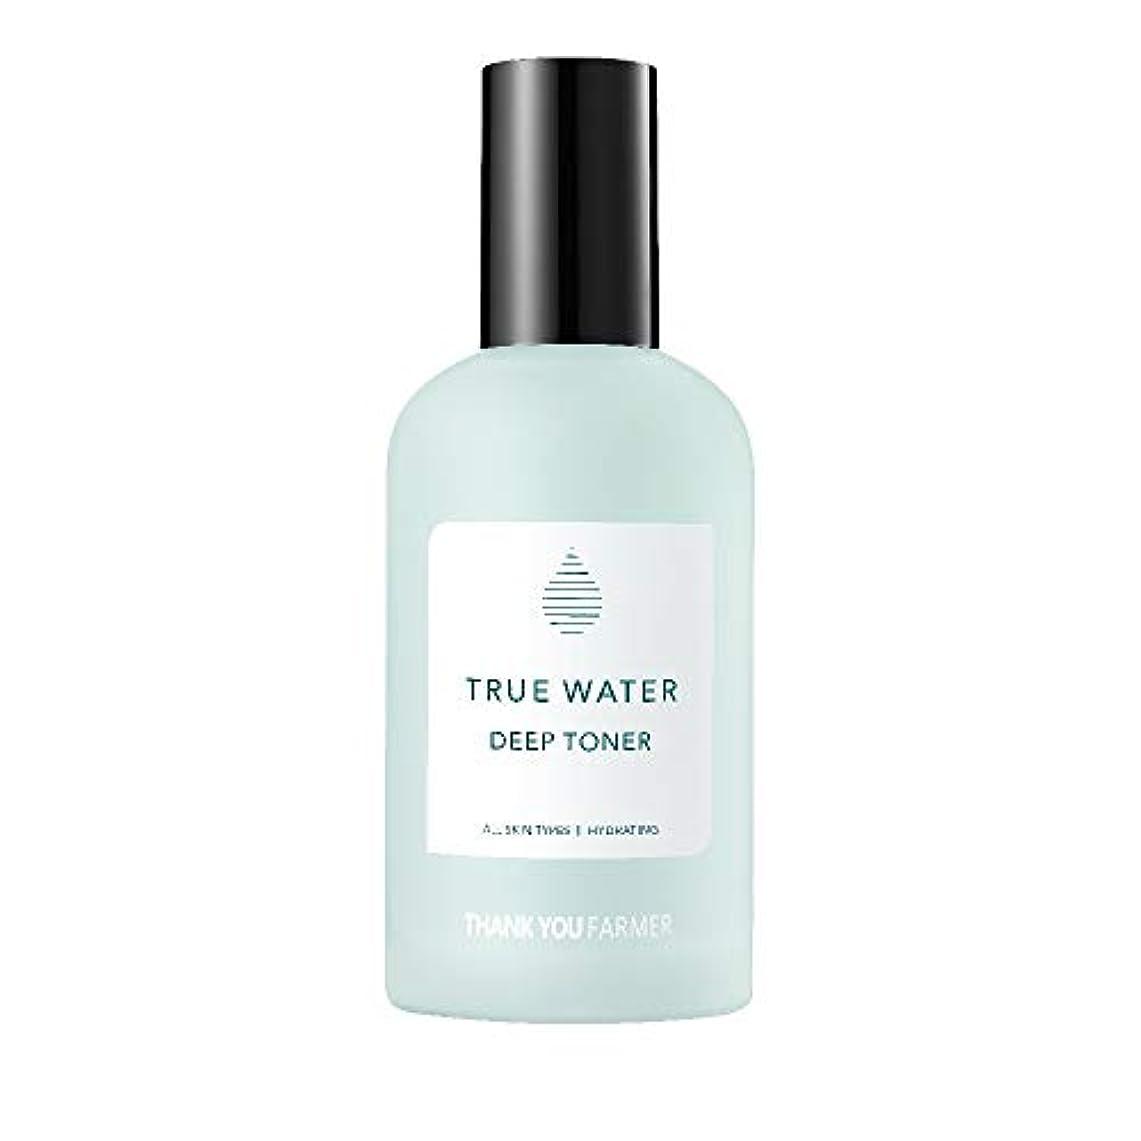 THANK YOU FARMER [サンキューファーマー] トゥルーウォーター ディープ トナー 化粧水